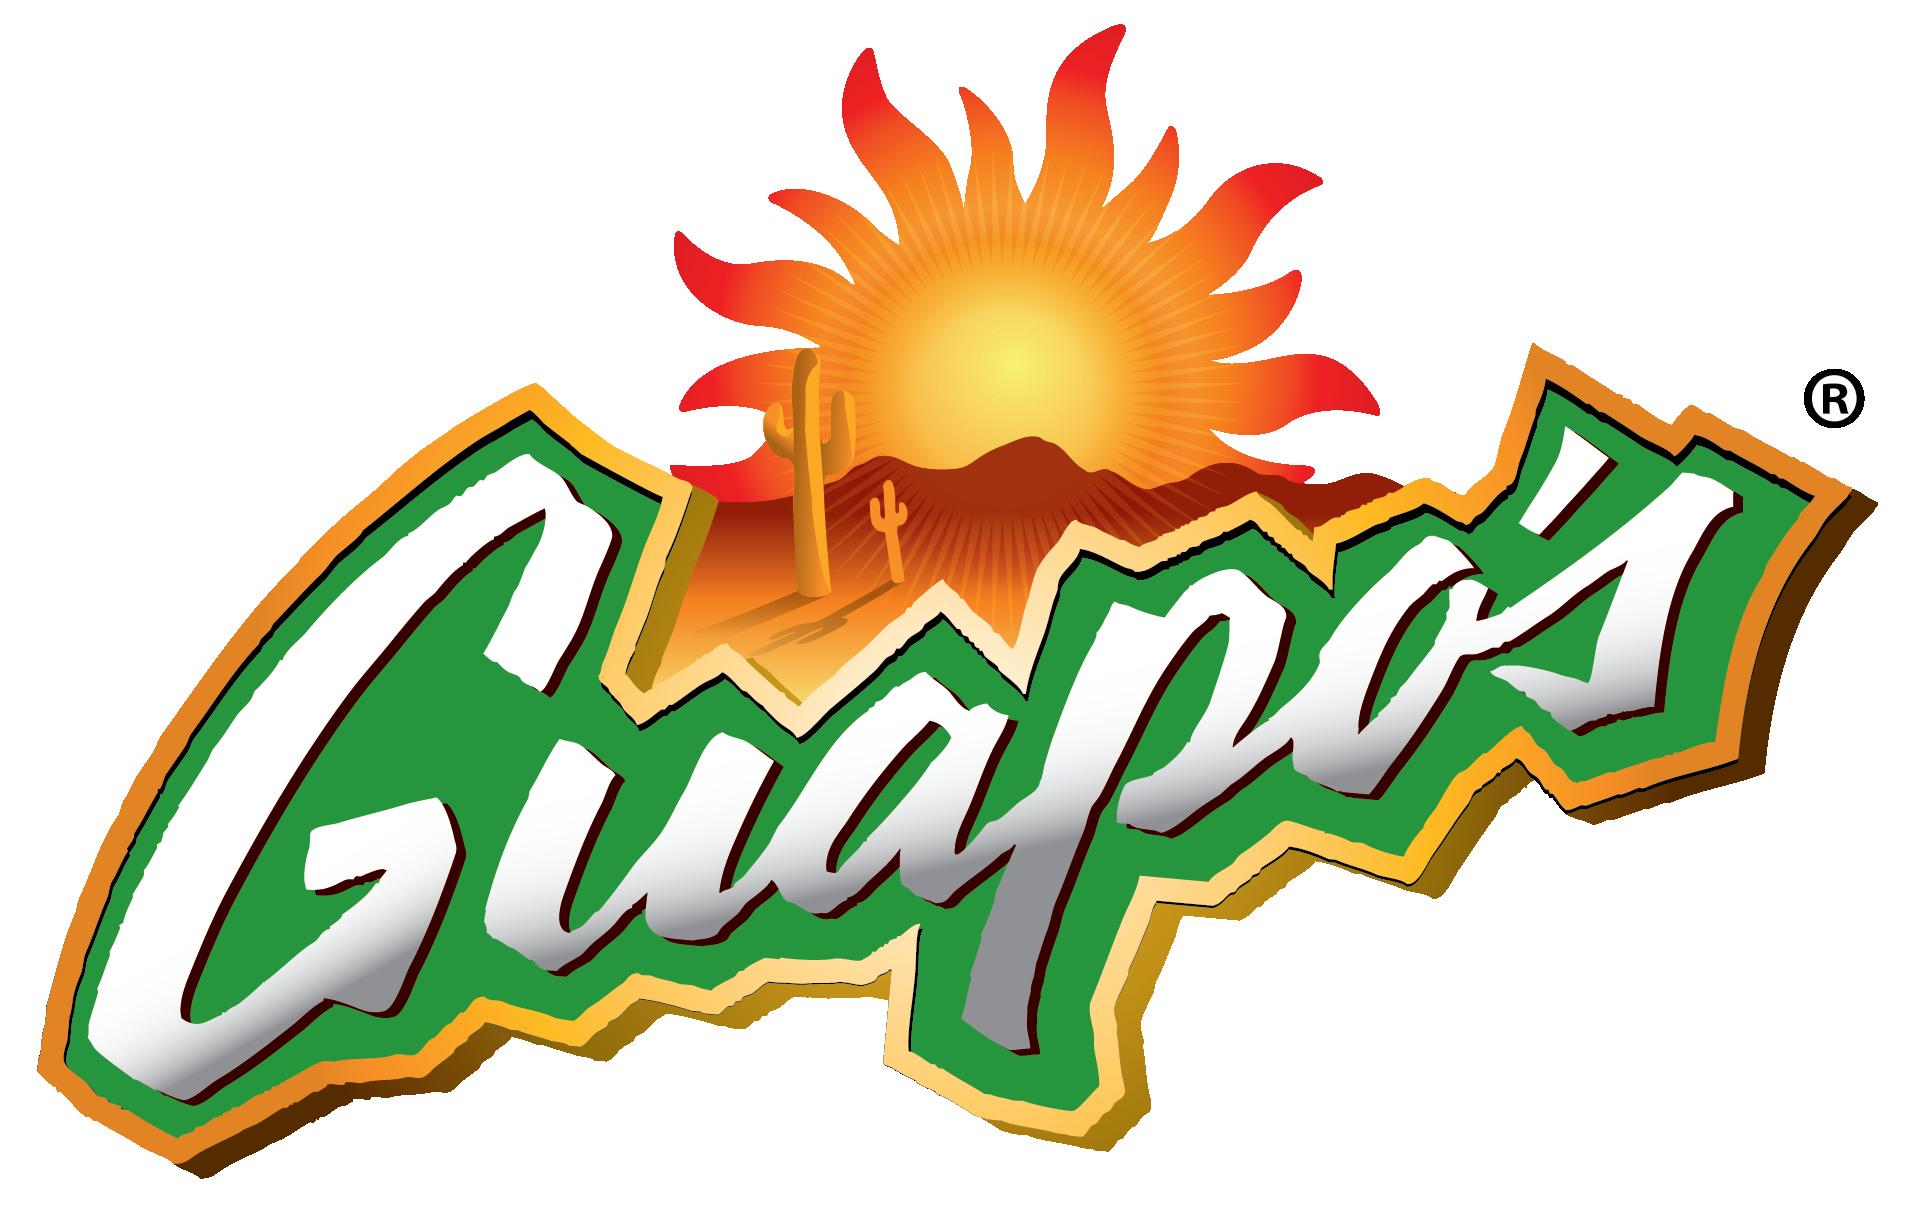 Guapo's Rotisserie Home